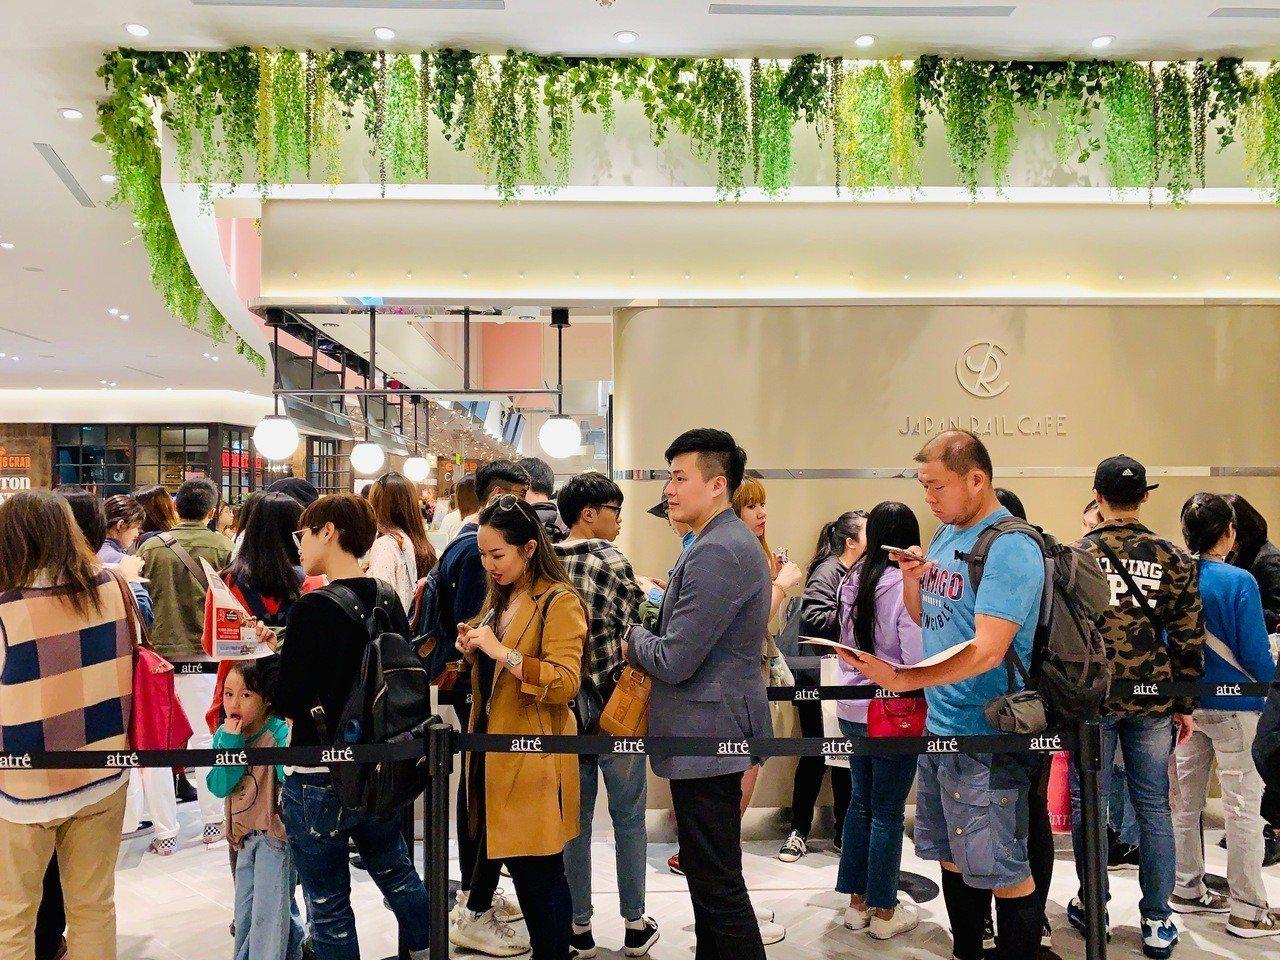 JAPAN RAIL CAFE最濃抹茶冰吸引民眾排隊購買。記者張芳瑜/攝影